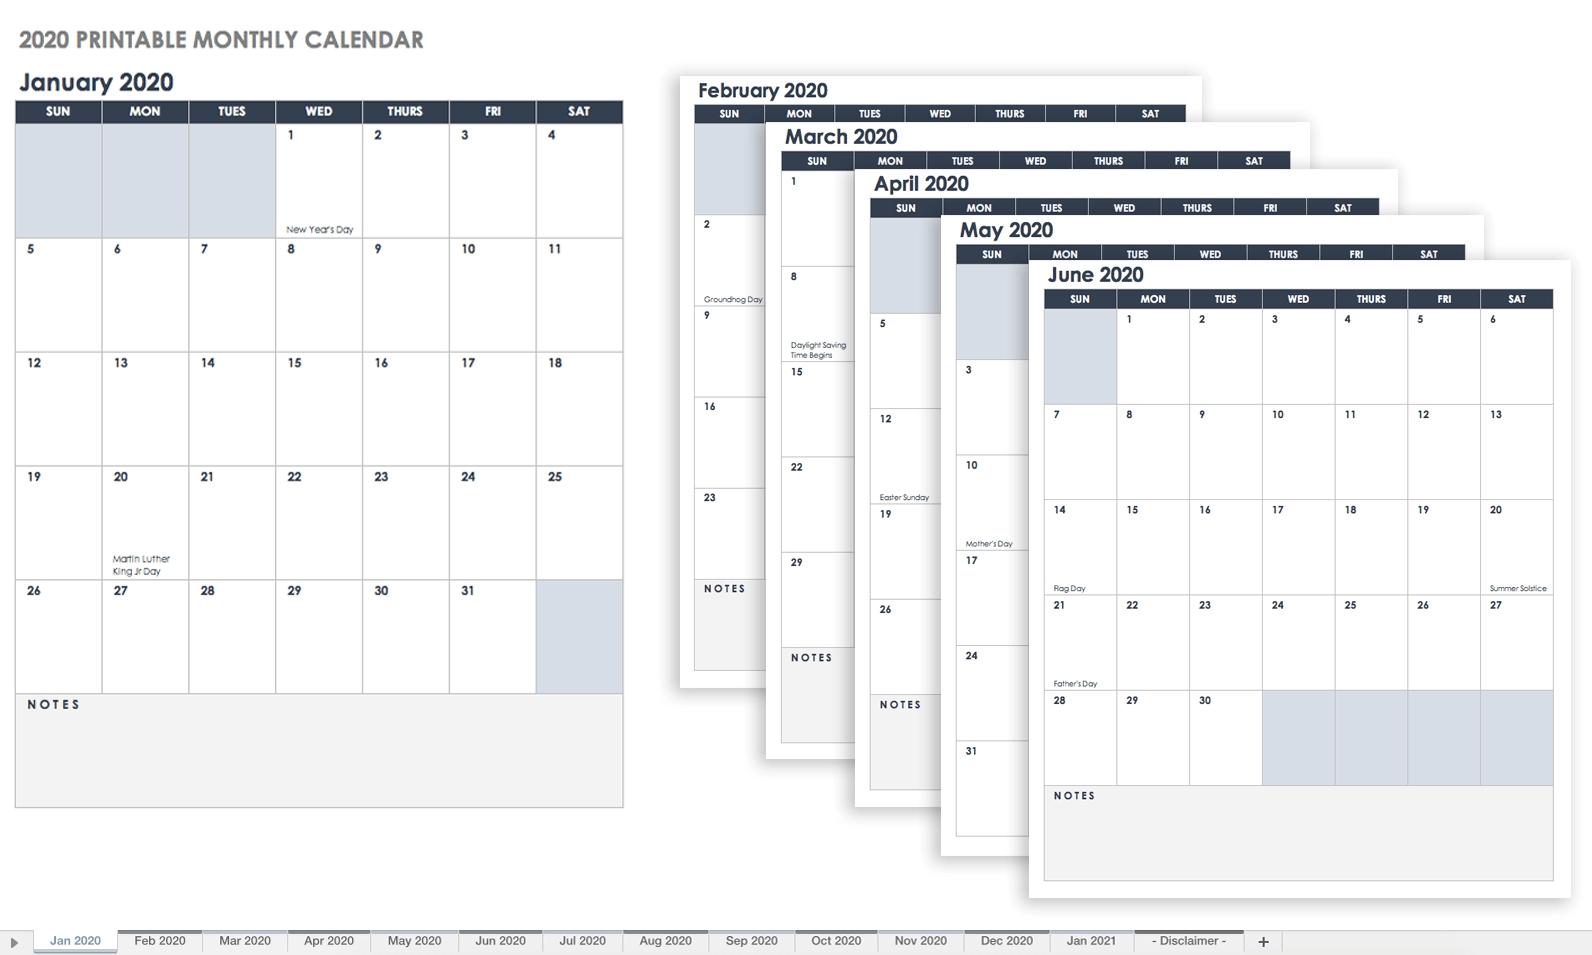 Free Blank Calendar Templates - Smartsheet inside Fill In Monthly Calendar Template